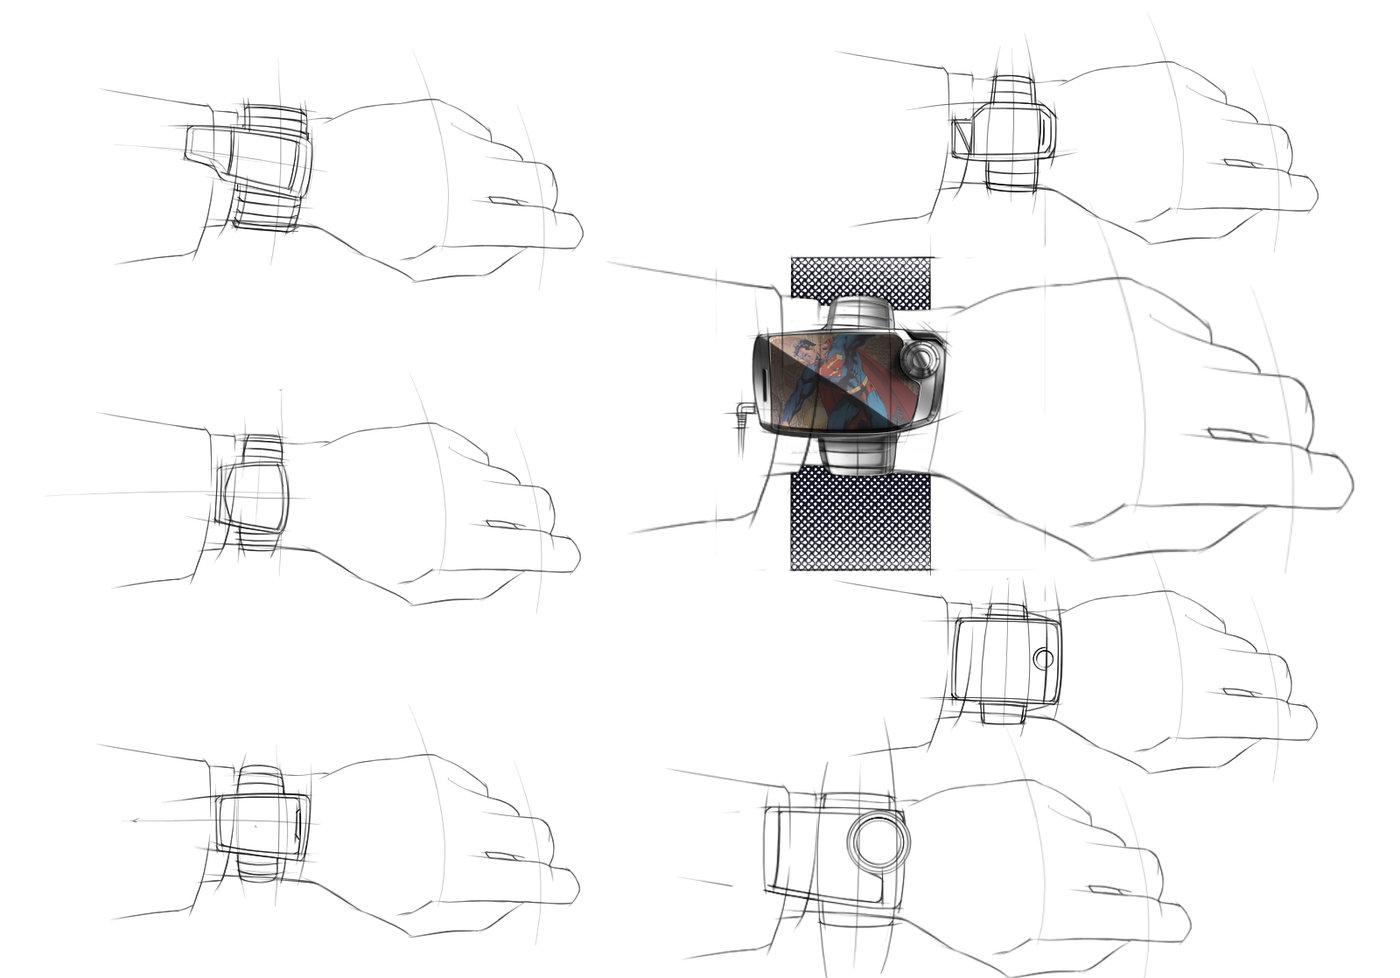 Smart Phone Sketching Rending Exercise by Alexander Farrow